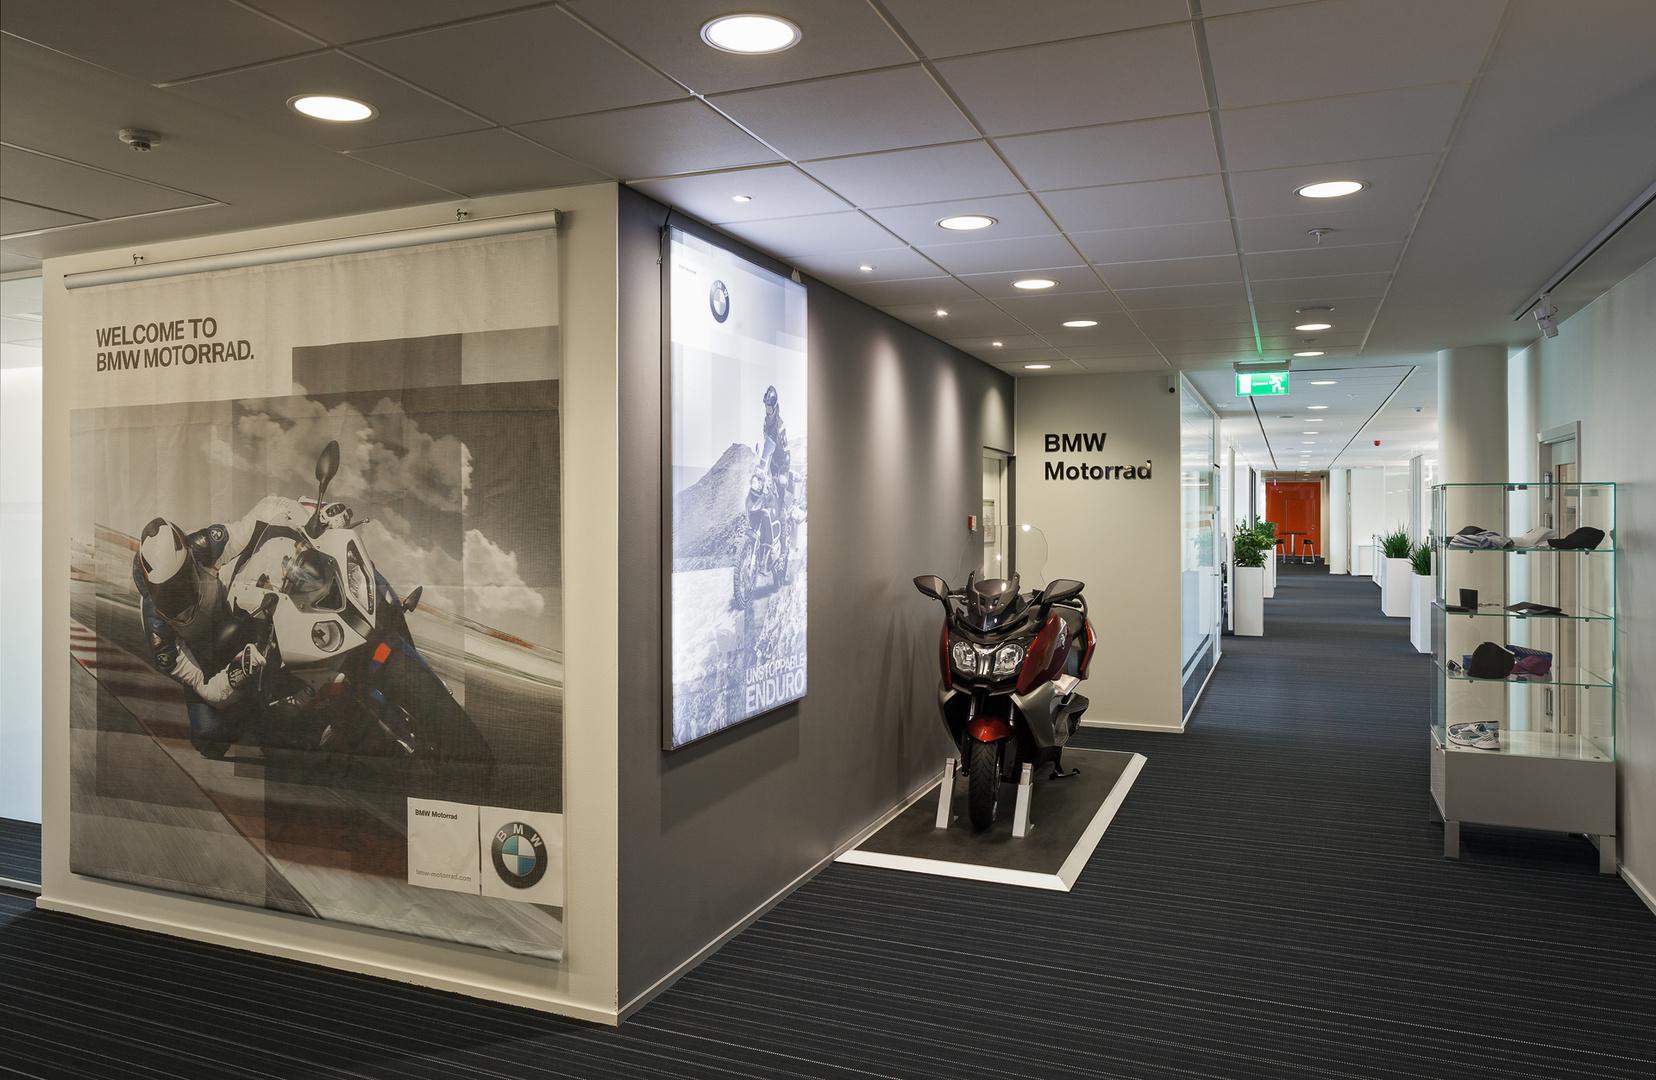 mp_BMW_03.jpg